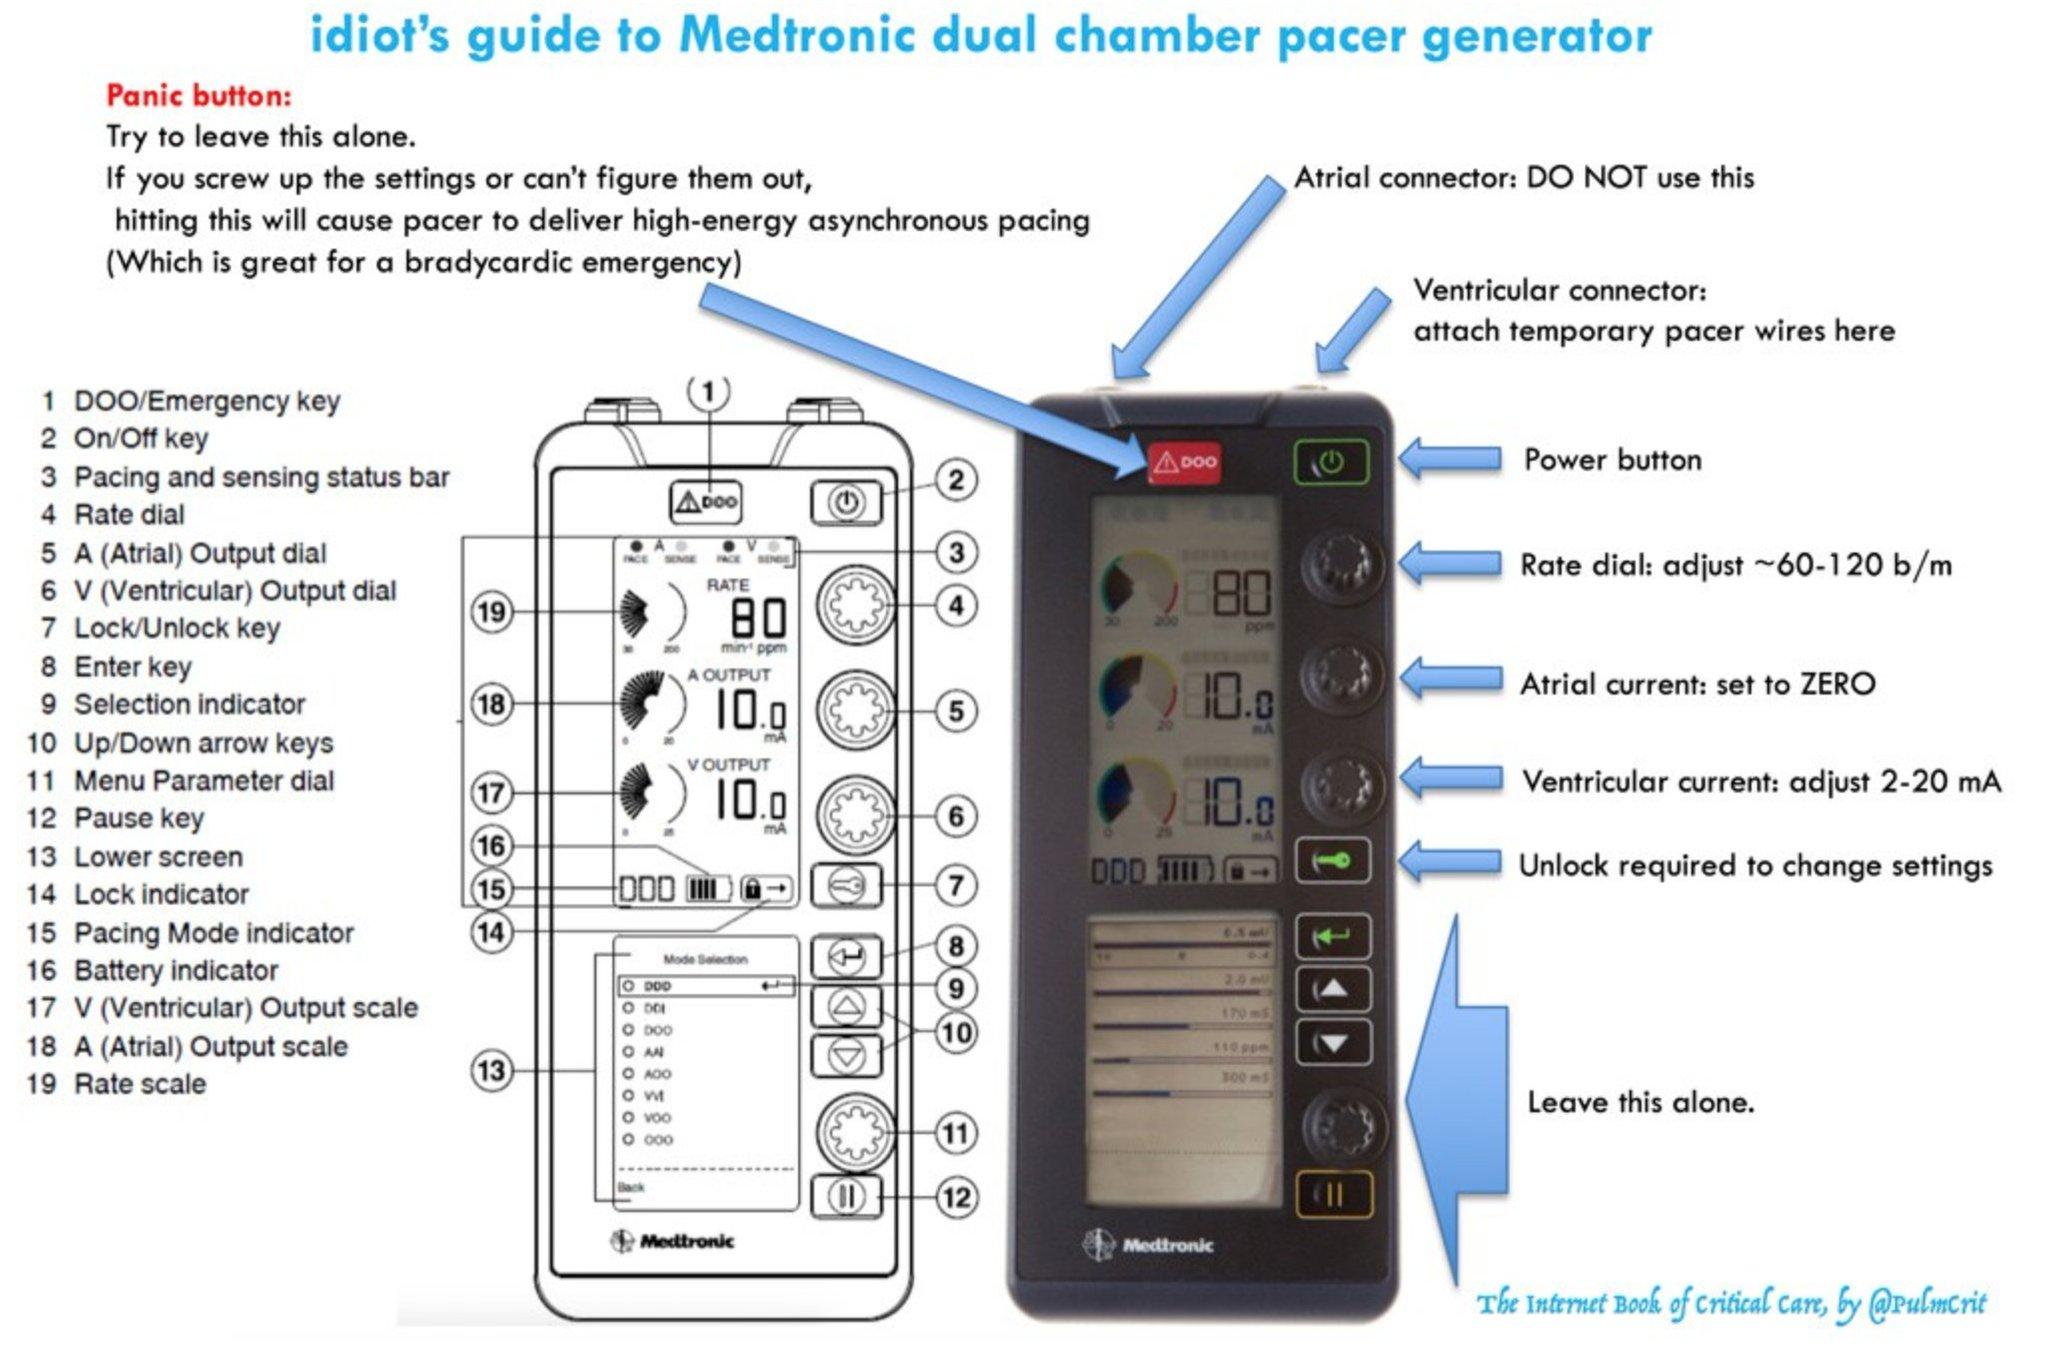 Salim R Rezaie Md On Twitter Bradycardia Via Pulmcrit Https T 6 Volt Generator Wiring Diagram For 9n Tco Ux4msaprqx Foamed